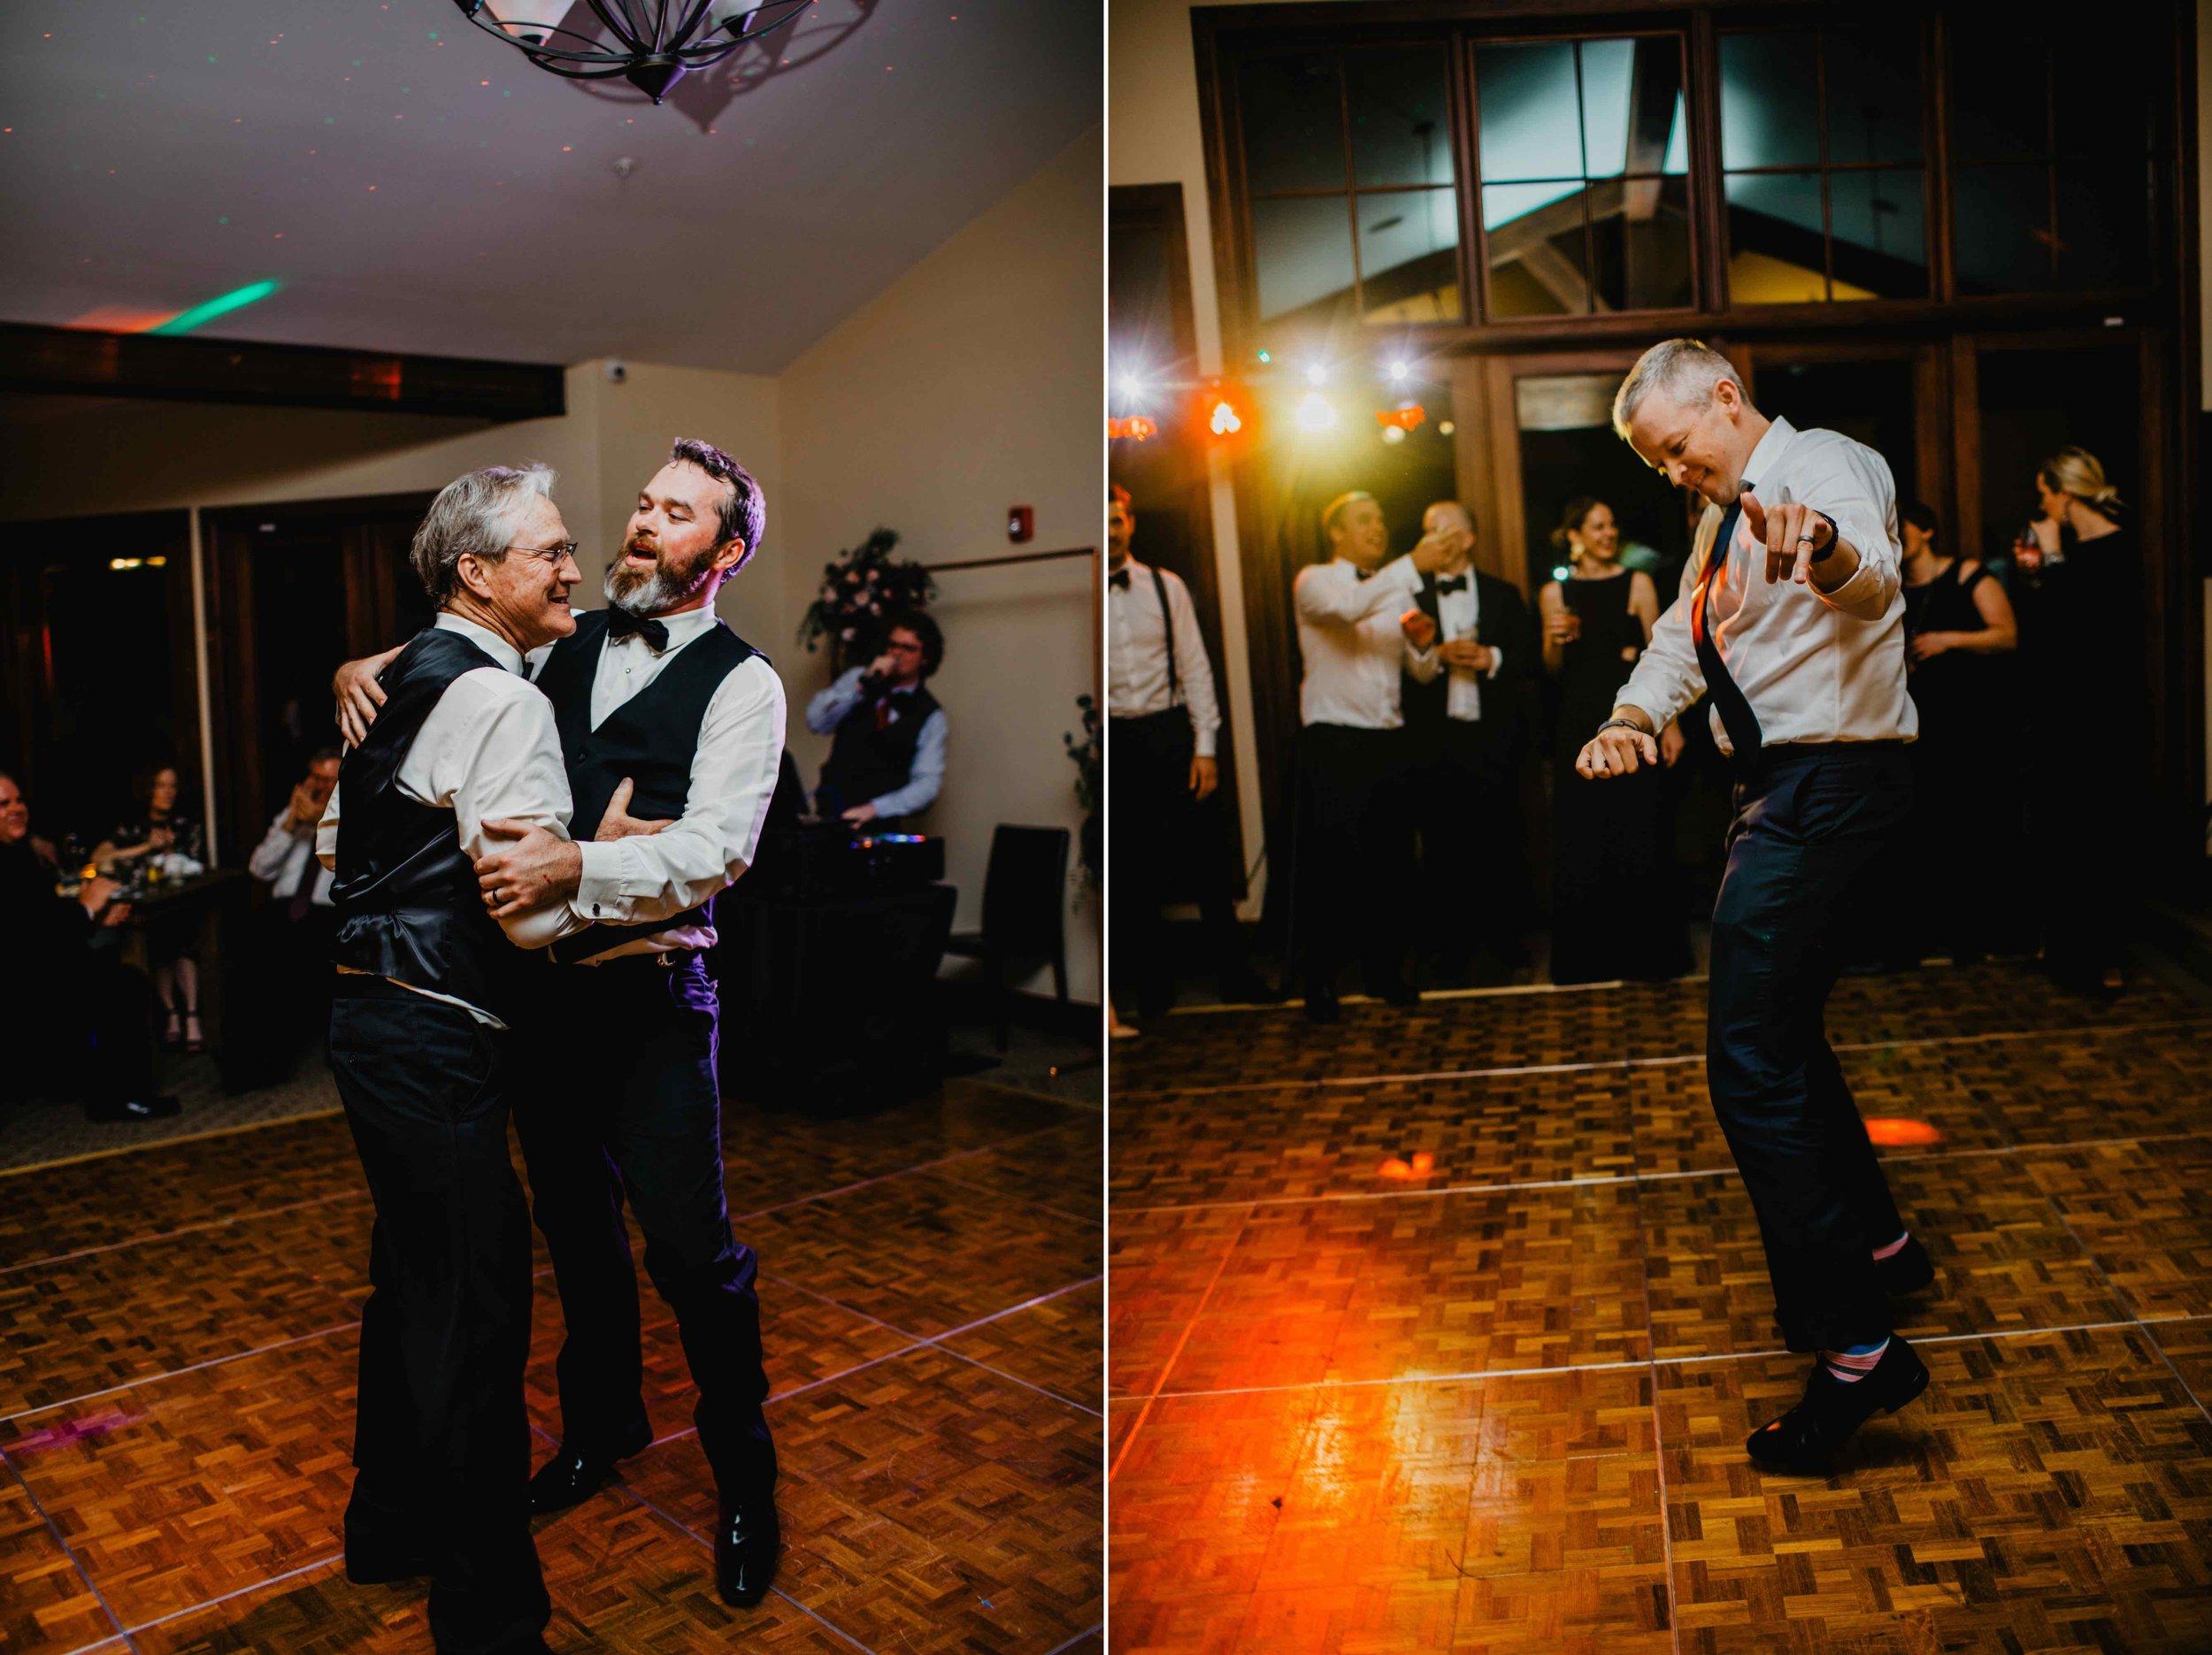 Kisa Conrad Favorites-0055-colorado-wedding-photographer-denver-springs-vailhotel-glenwood-springs-colorado-wedding-photographer.jpeg